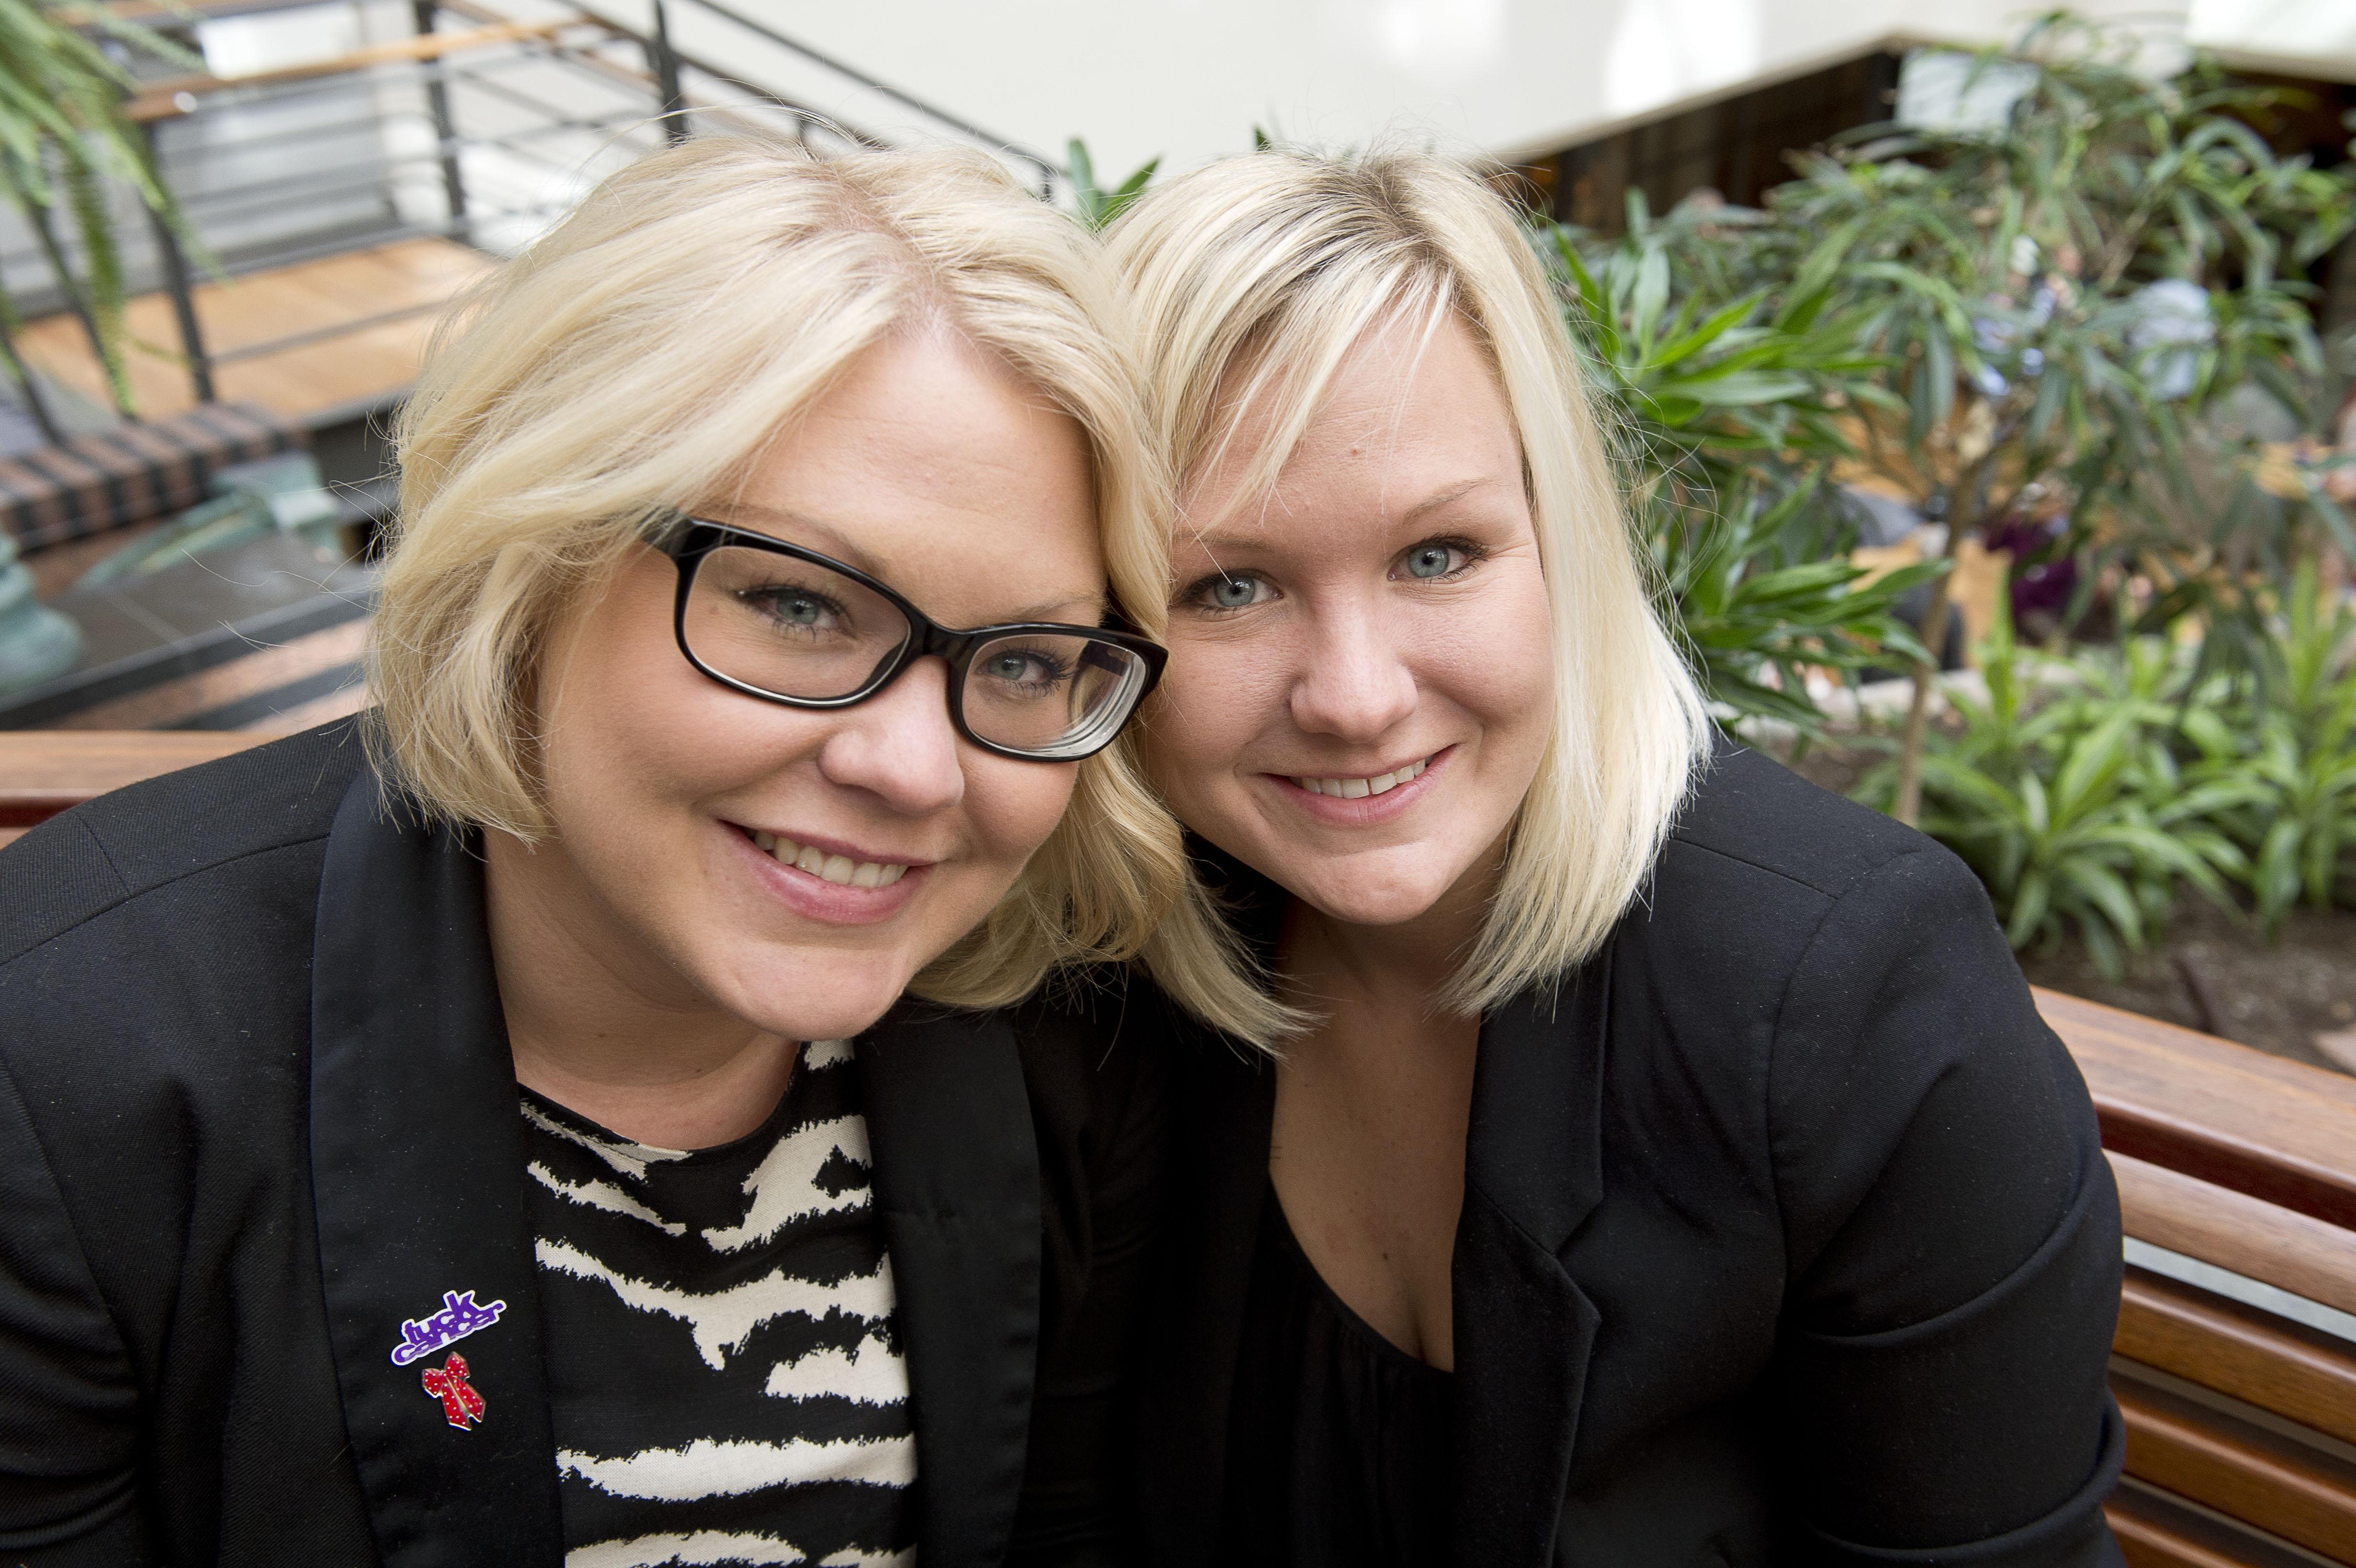 Stockholm 20120507Blodcancerdagen 2012Bilden:Foto: ROGER VIKSTRÖM